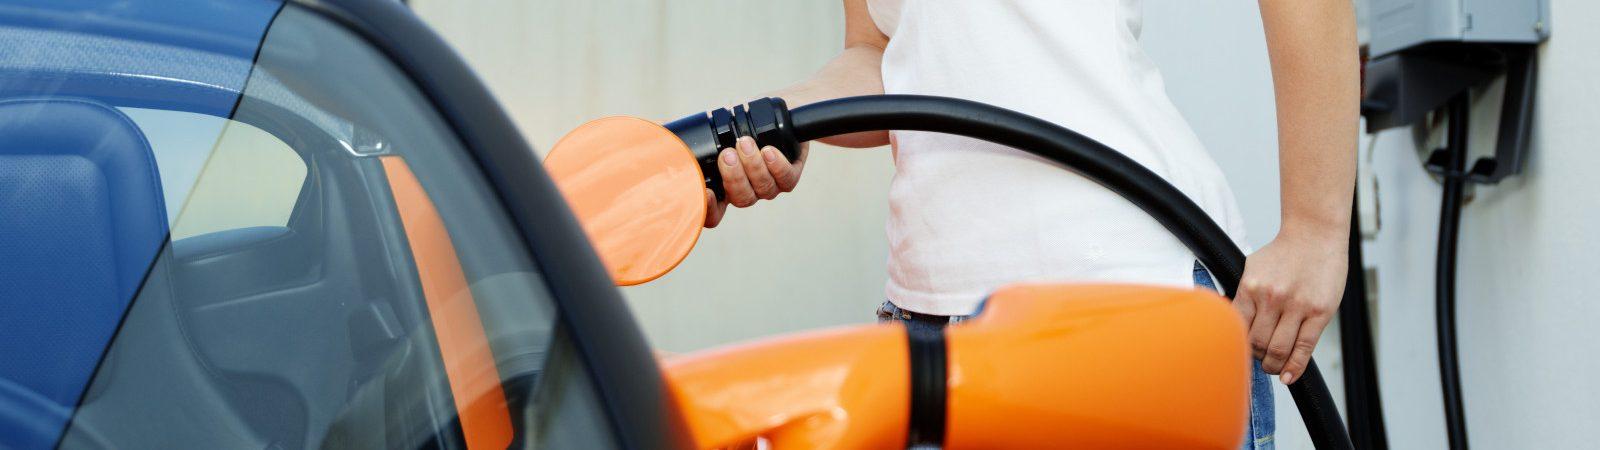 Elektroauto Förderung: Frau lädt Elektroauto an Wallbox